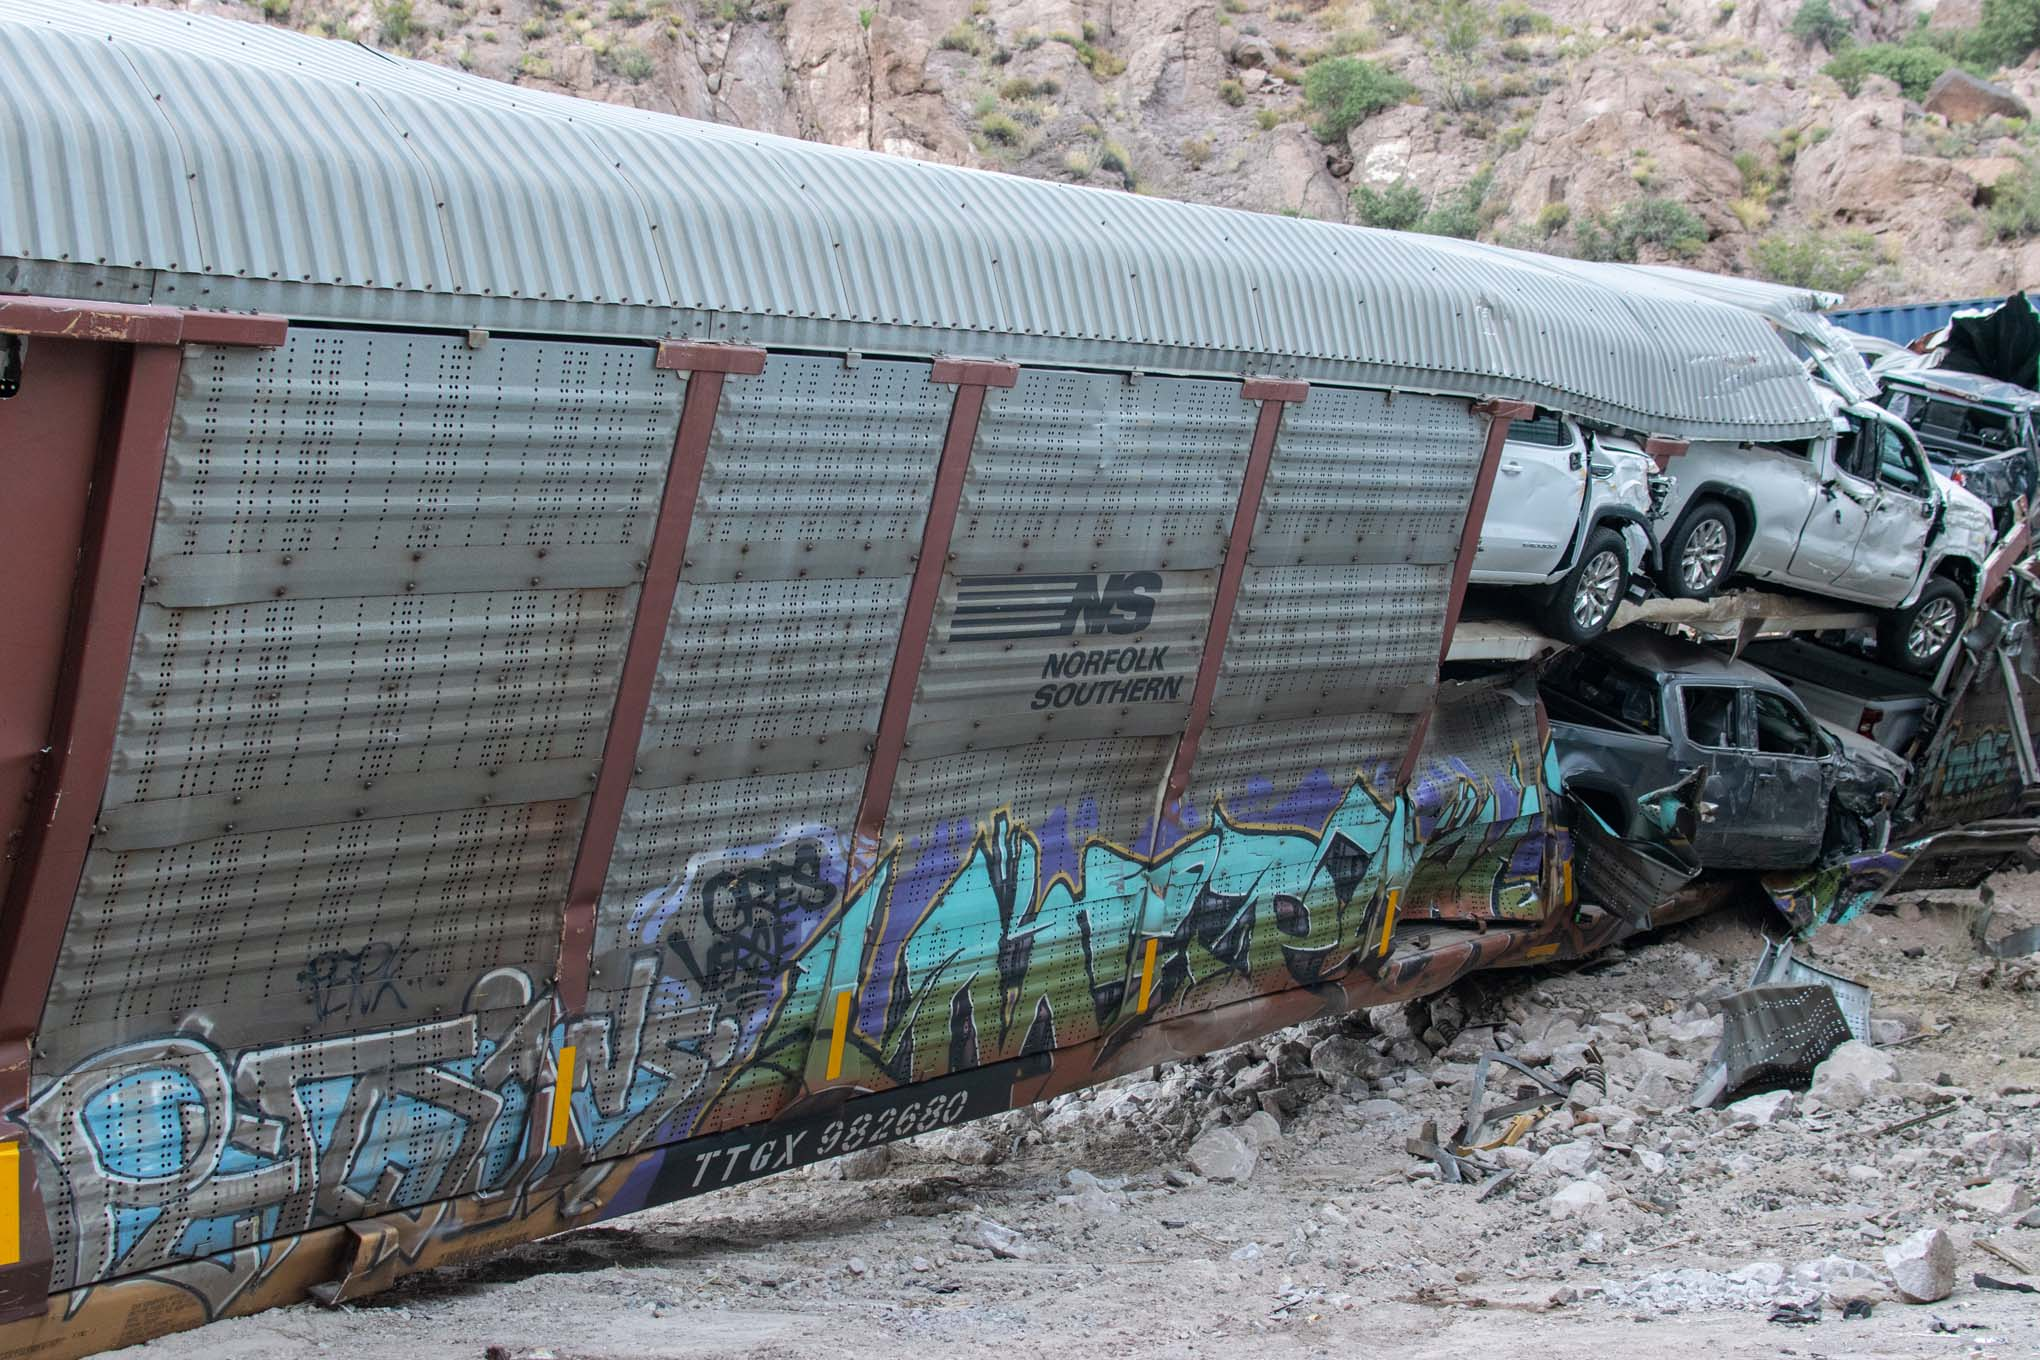 Nevada Train Derailment- EXCLUSIVE PHOTOS AND VIDEO